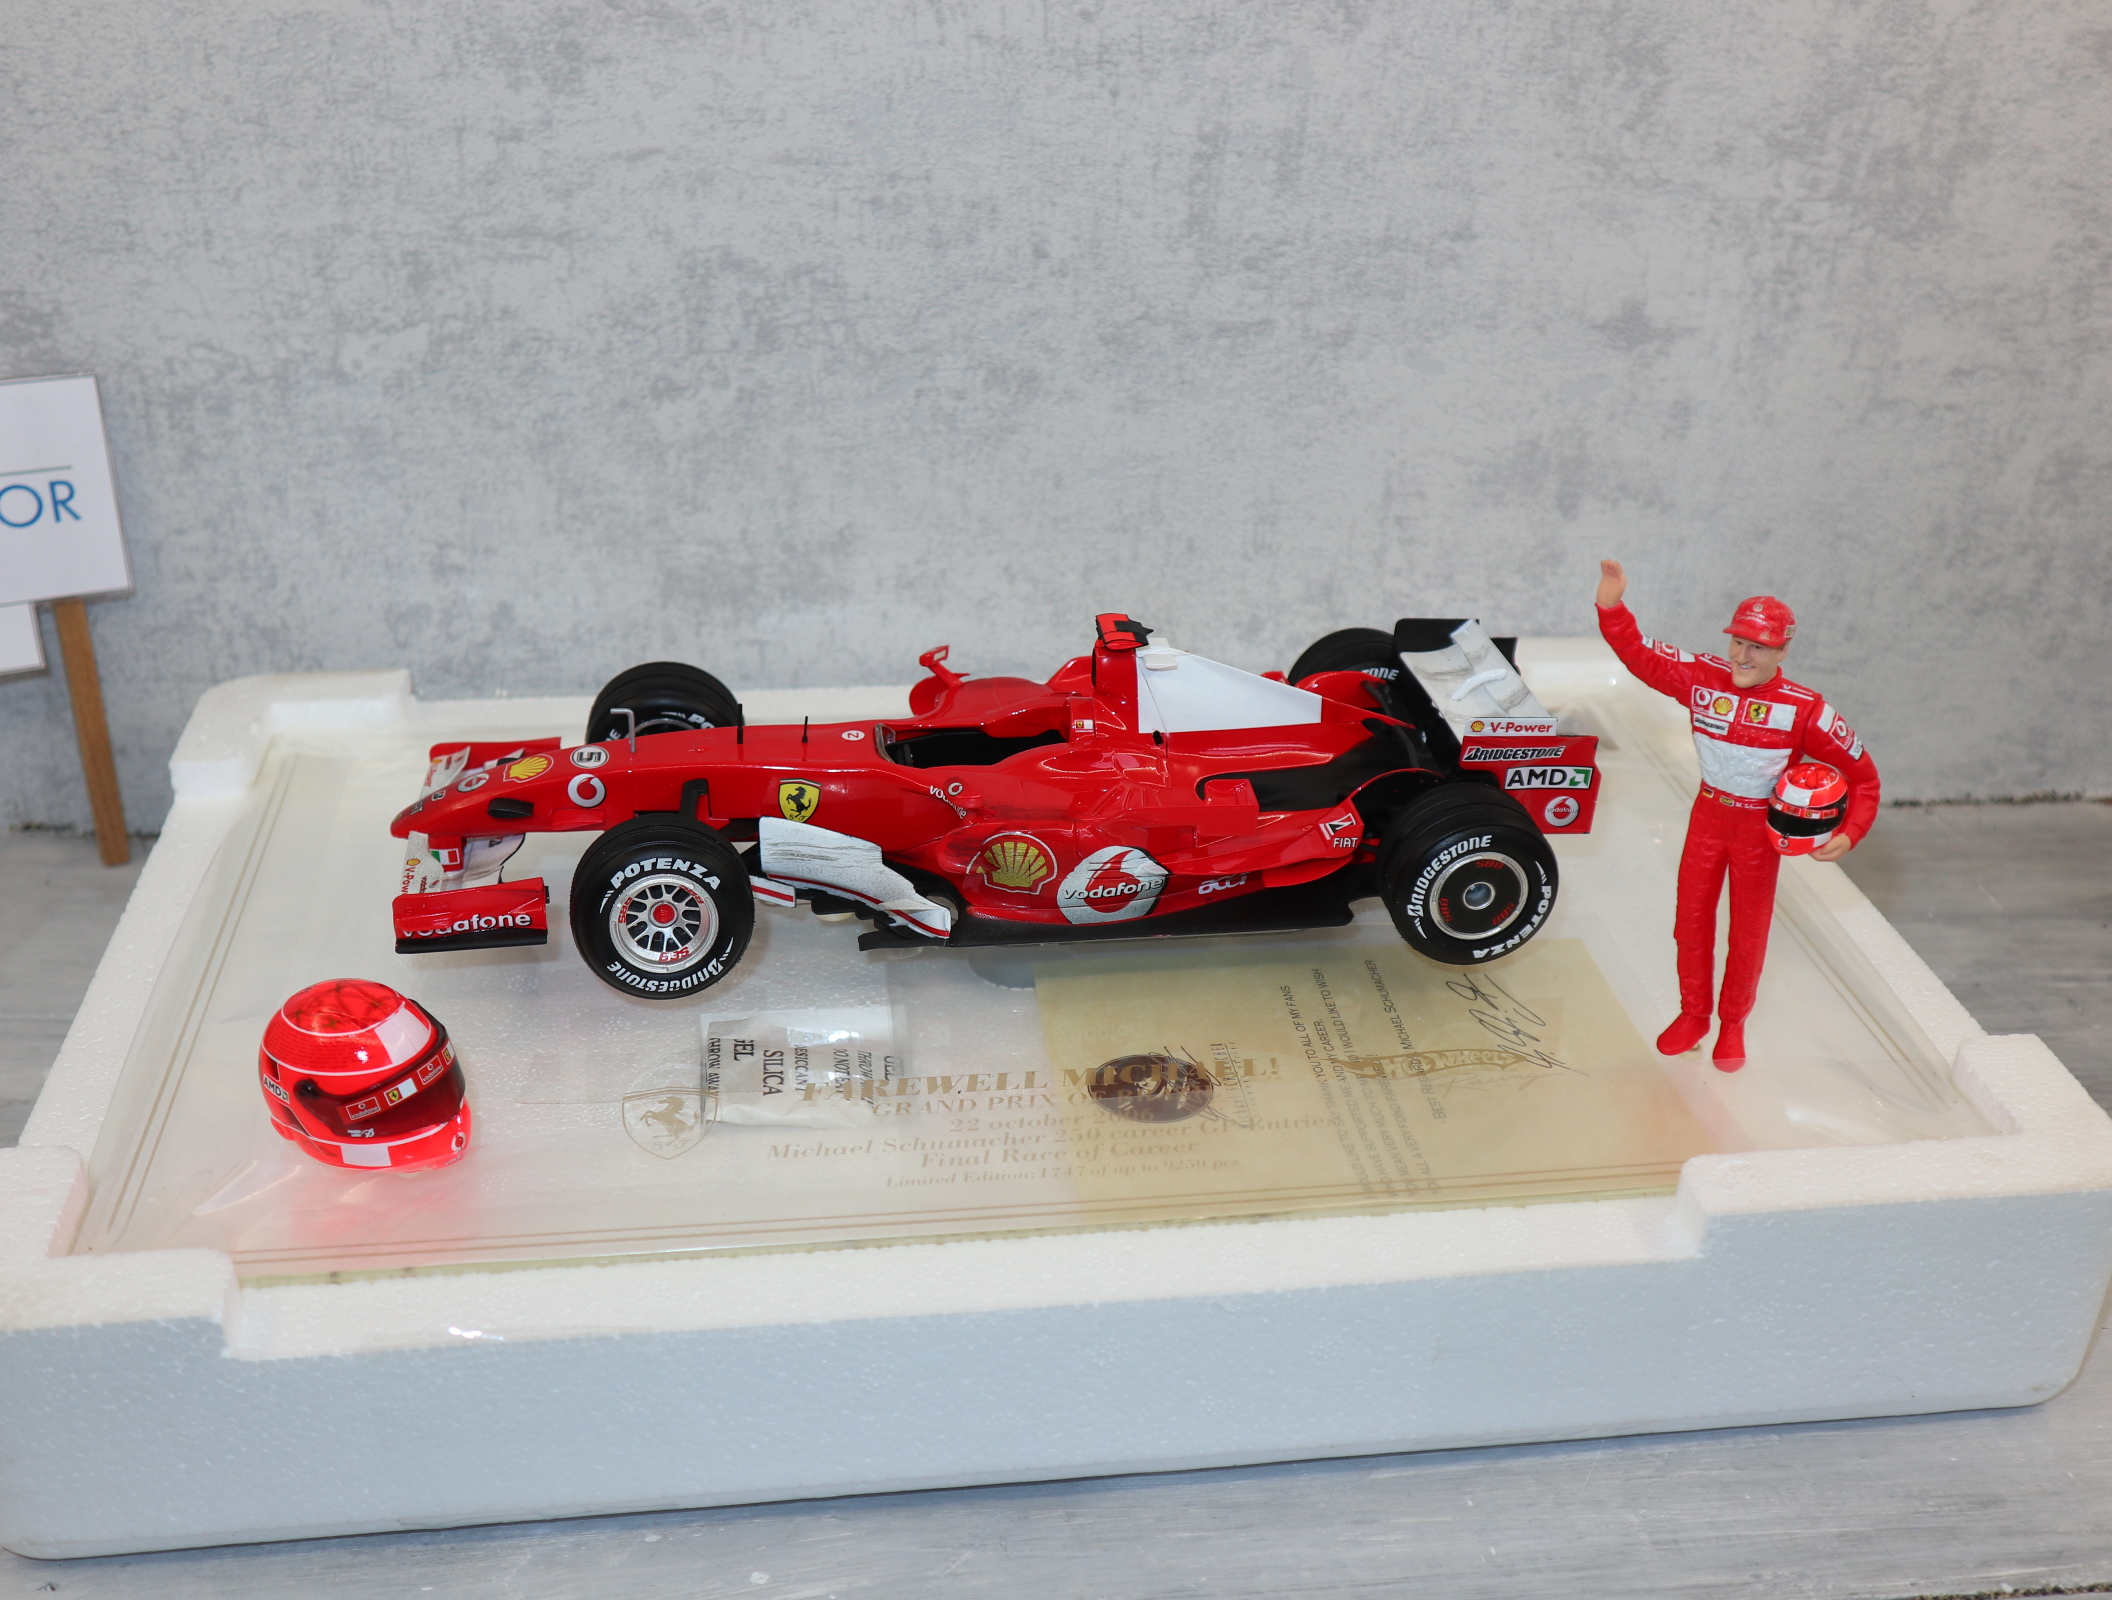 Hot Wheels J2996 1:18 Michael Schumacher Ferrari 248F1 Brasilien 21.10.06 komplett in OVP